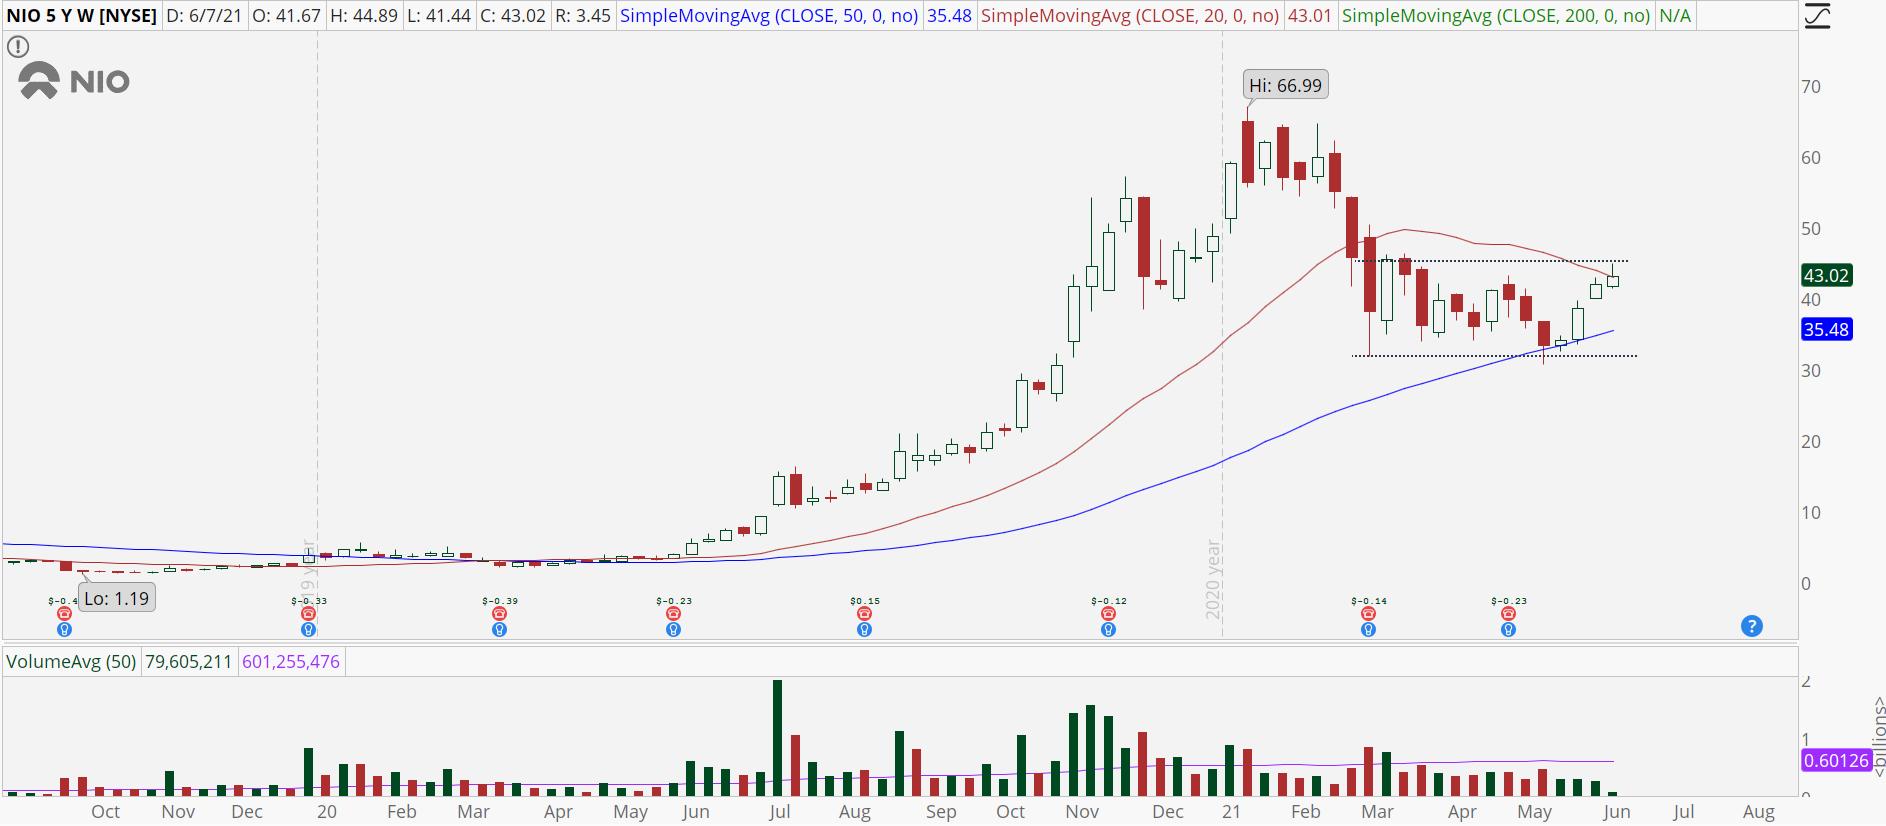 Nio (NIO) weekly stock chart with trading range.